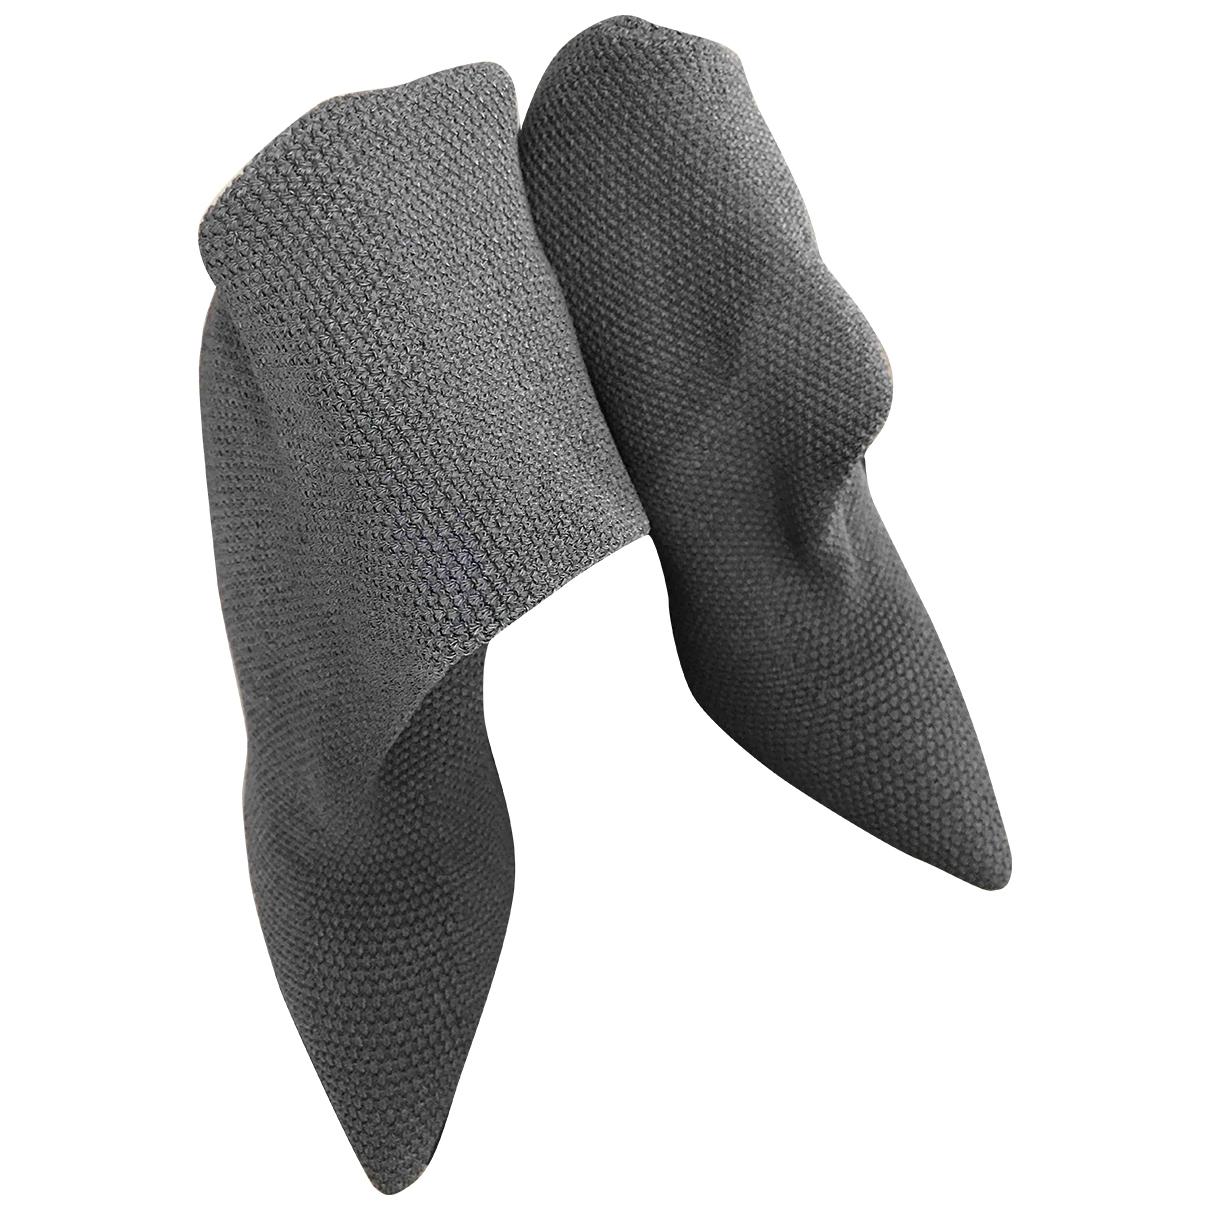 Yeezy \N Grey Cloth Boots for Women 38 EU